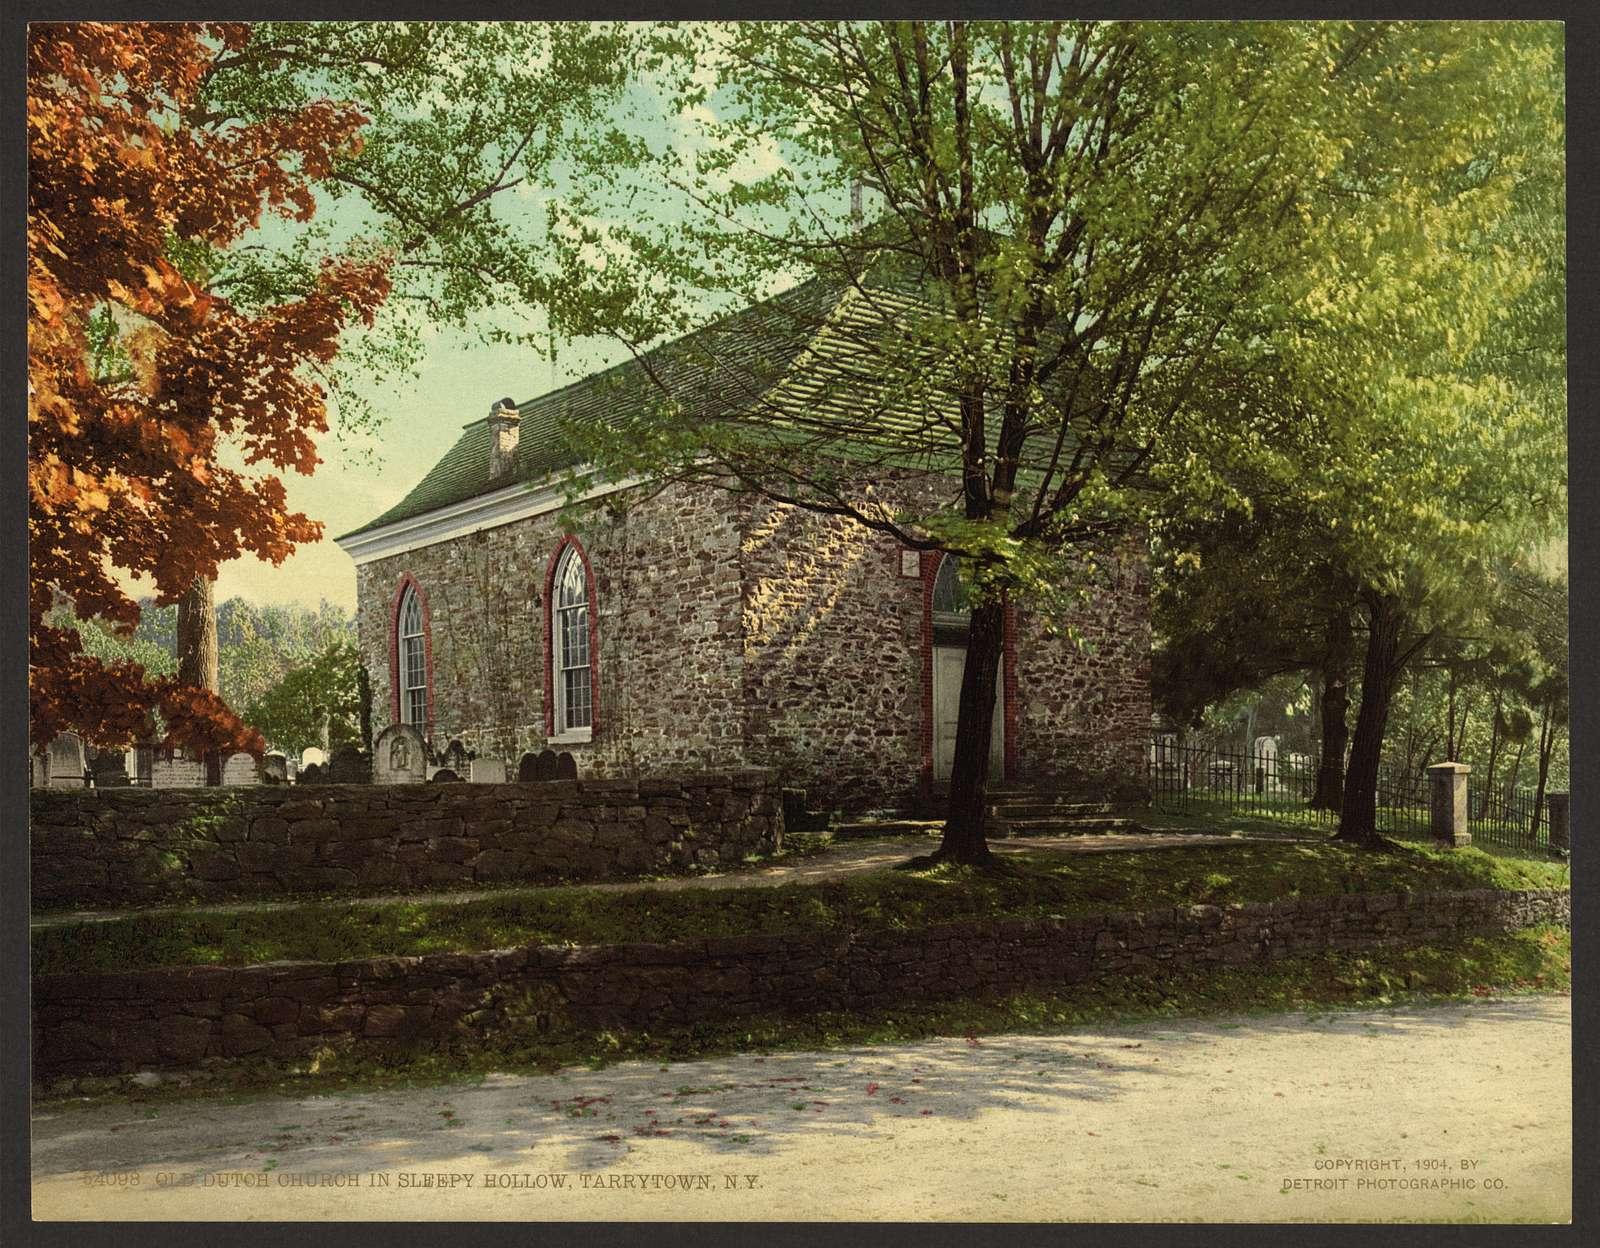 Old Dutch church in Sleepy Hollow, Tarrytown, N.Y.